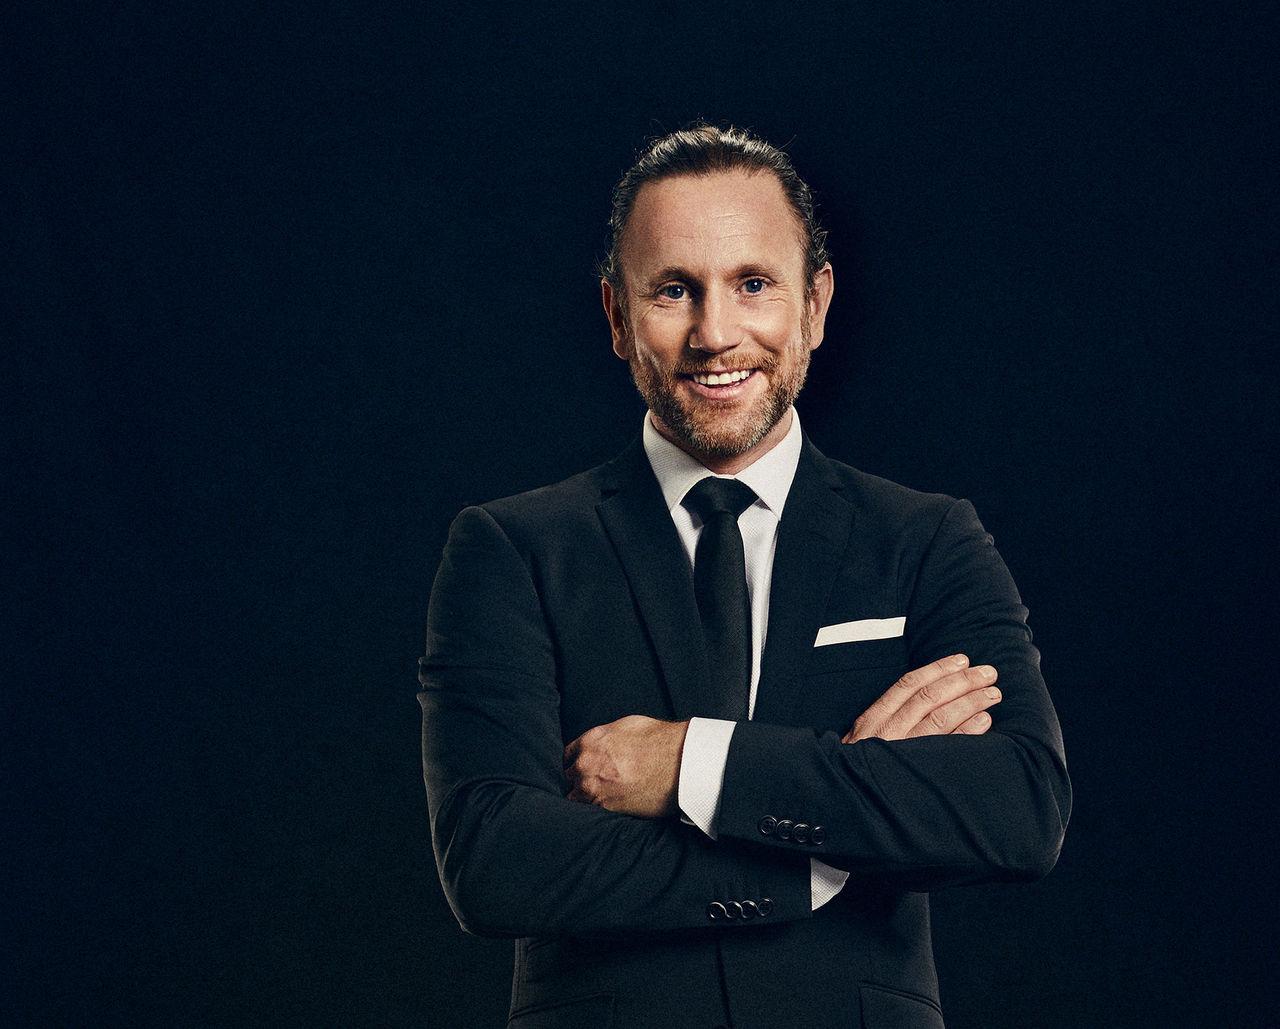 Peter Jihde slutar på TV4